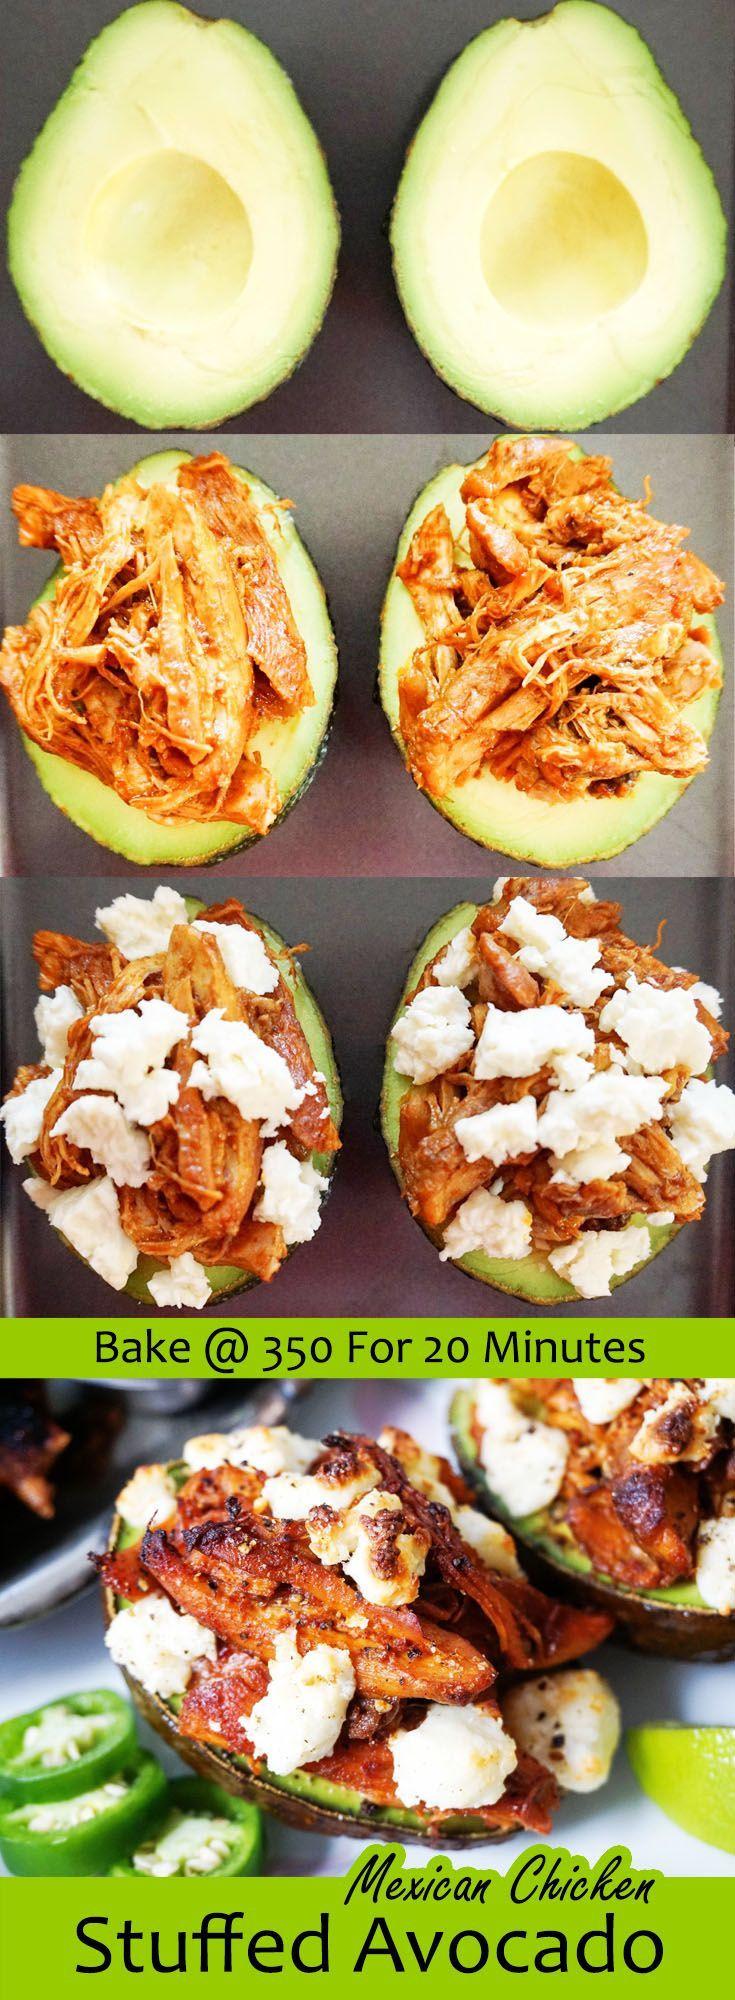 Keto Diet Recipes Free  The 25 best Ketogenic t ideas on Pinterest